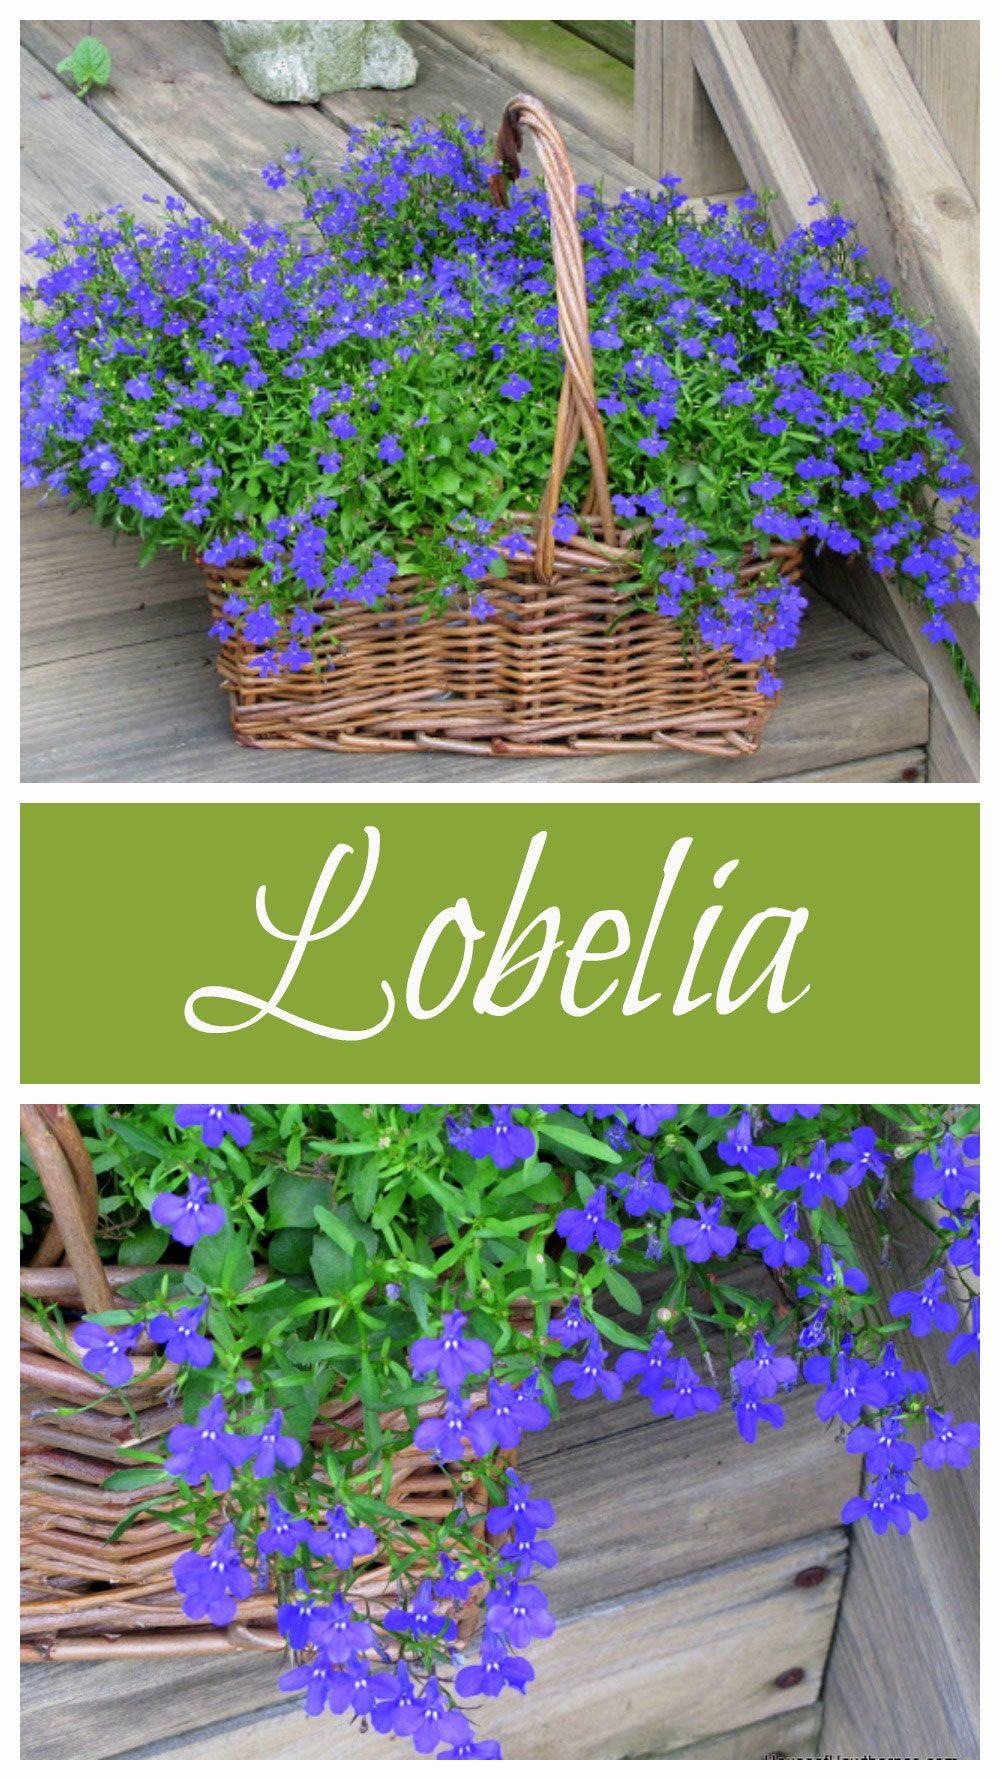 Lobelia Love Tips For Growing Lobelia Plants Diy Ideas